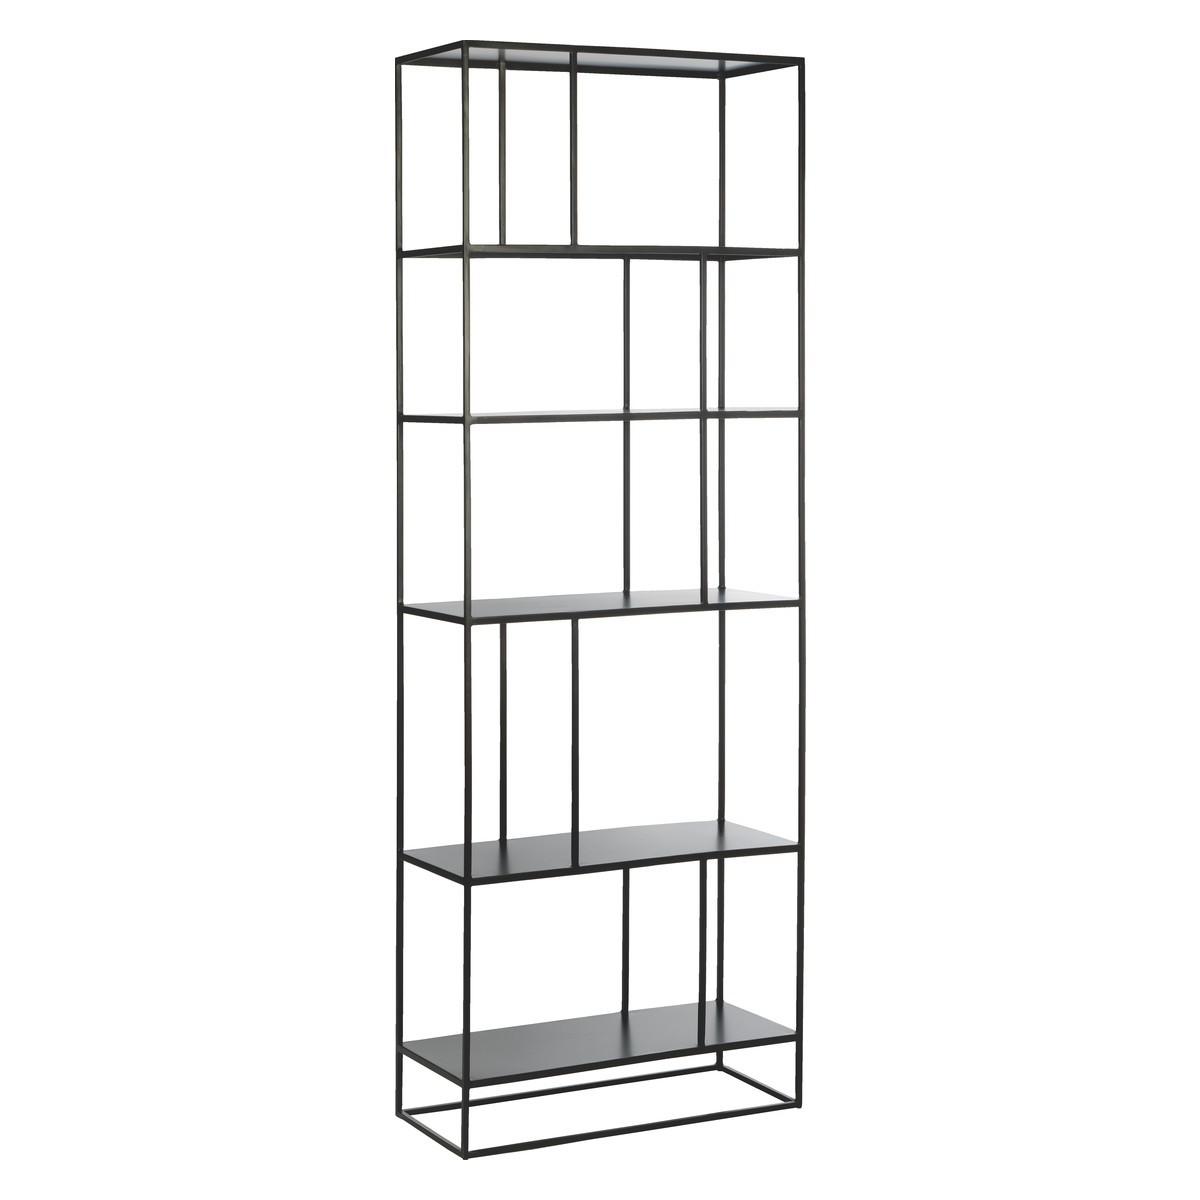 Care instructions for metal bookshelf ypuqmlh IKFLUOI